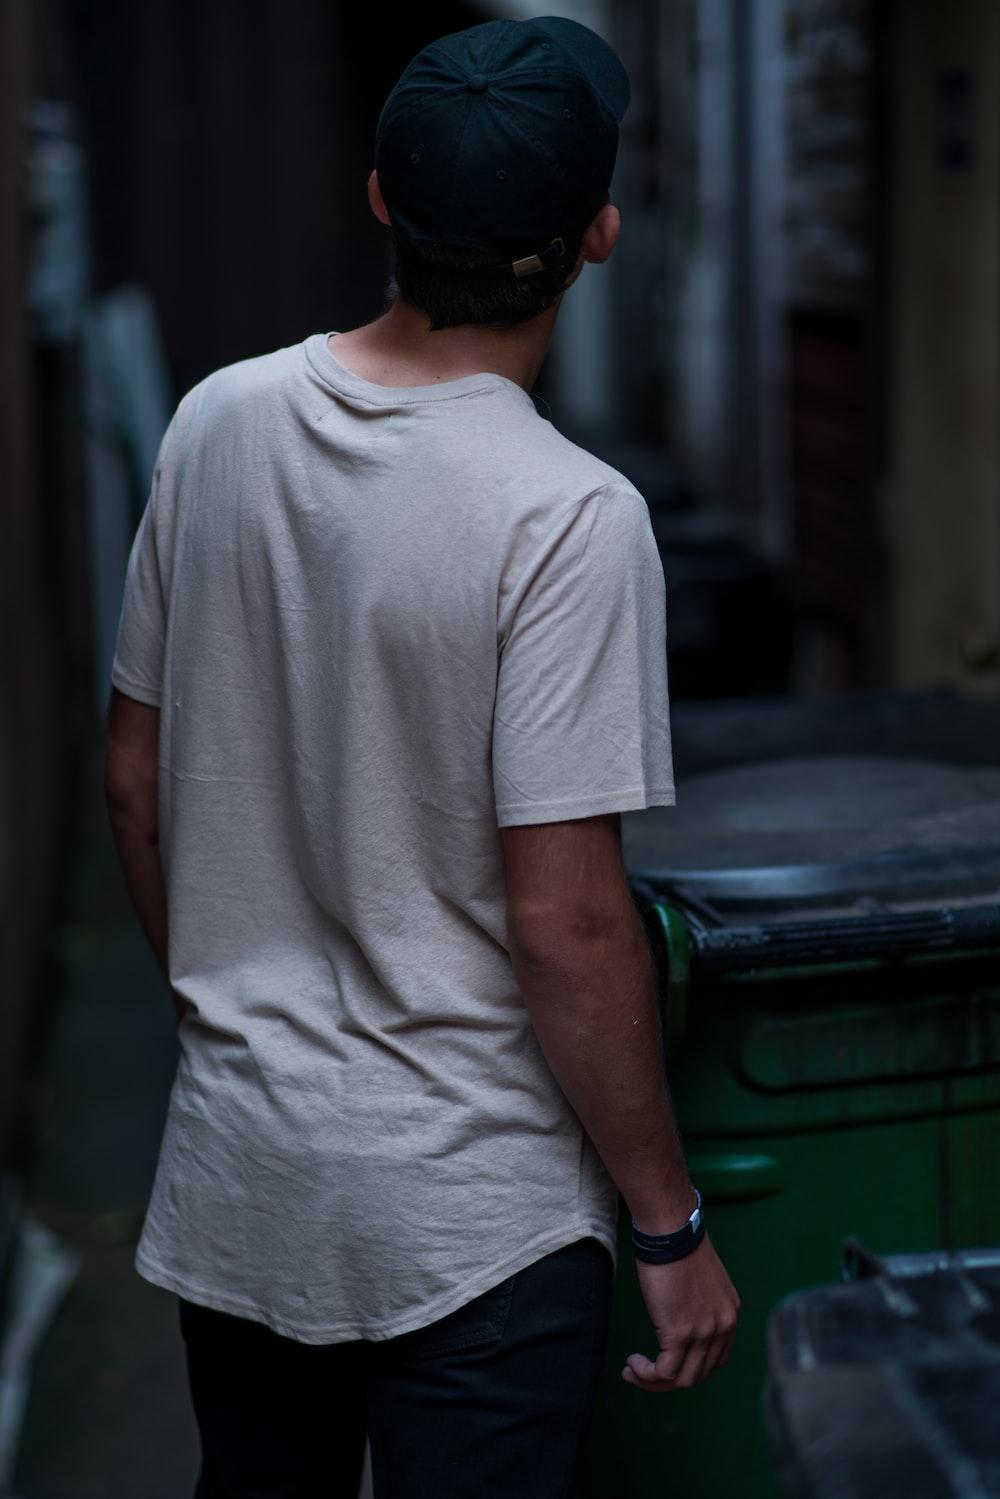 man wearing white shirt beside wheelie bin